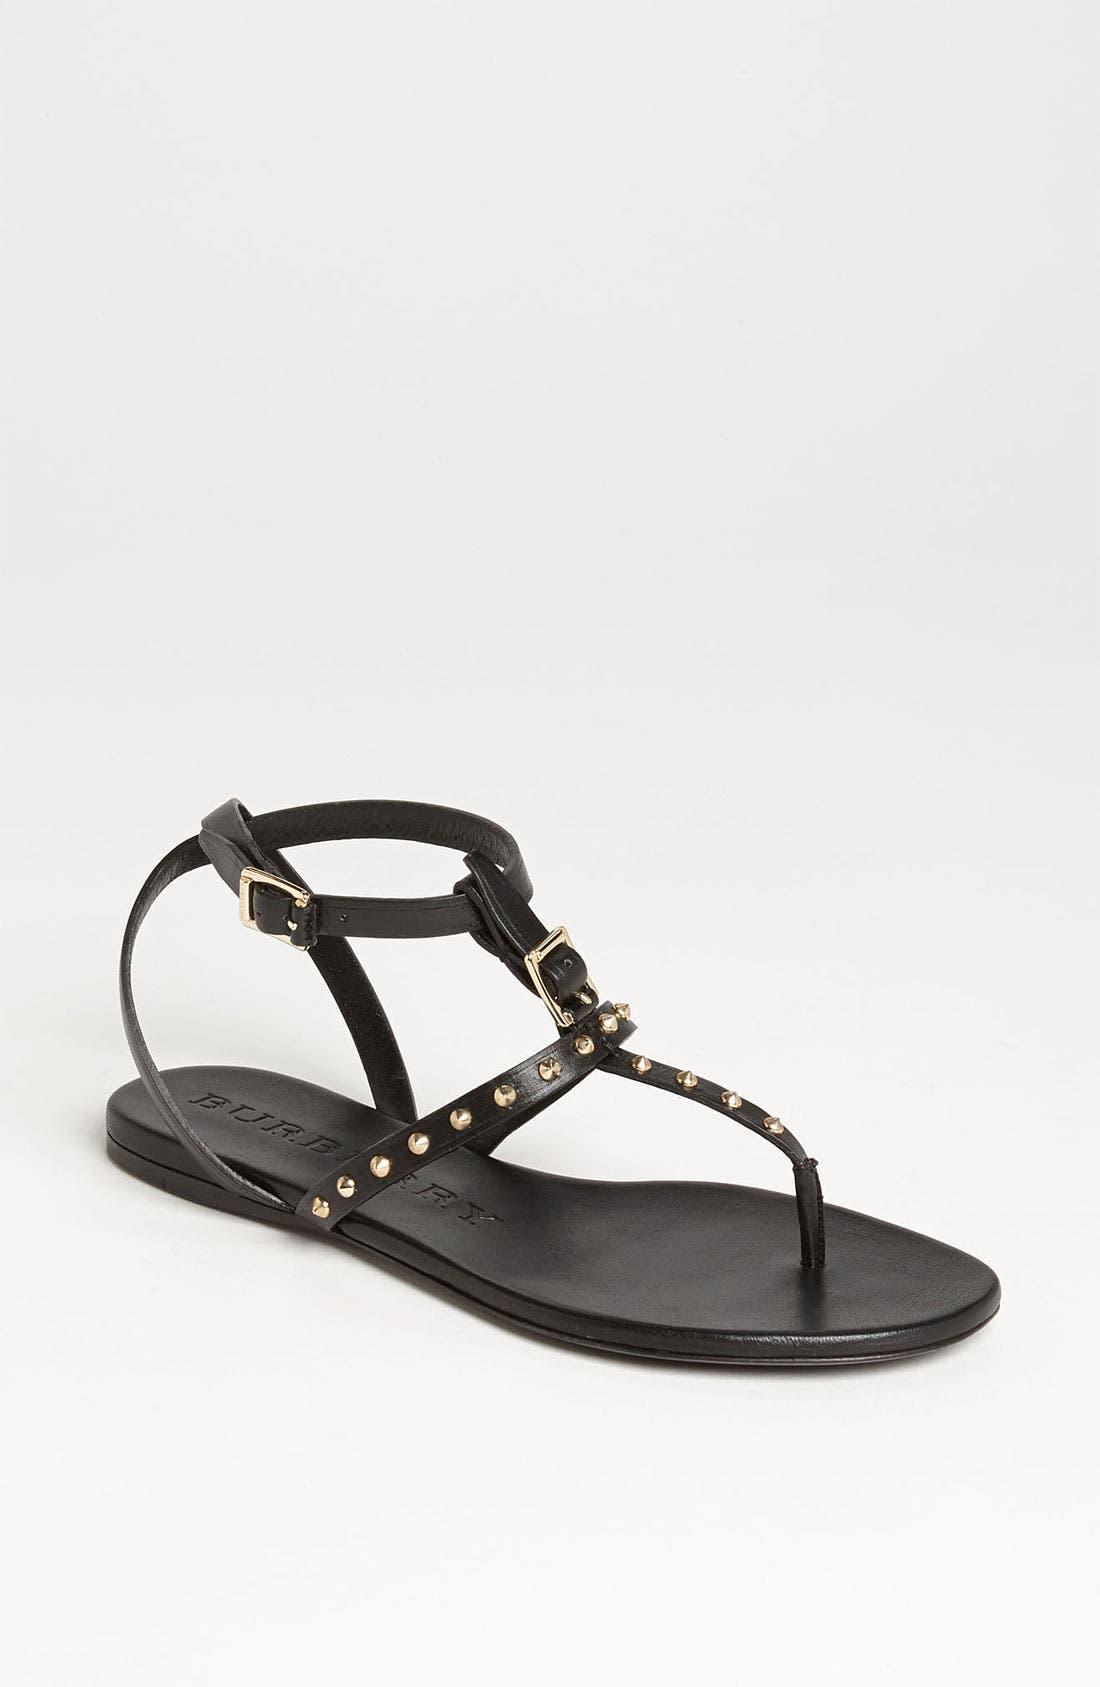 Main Image - Burberry 'Masefield' Sandal